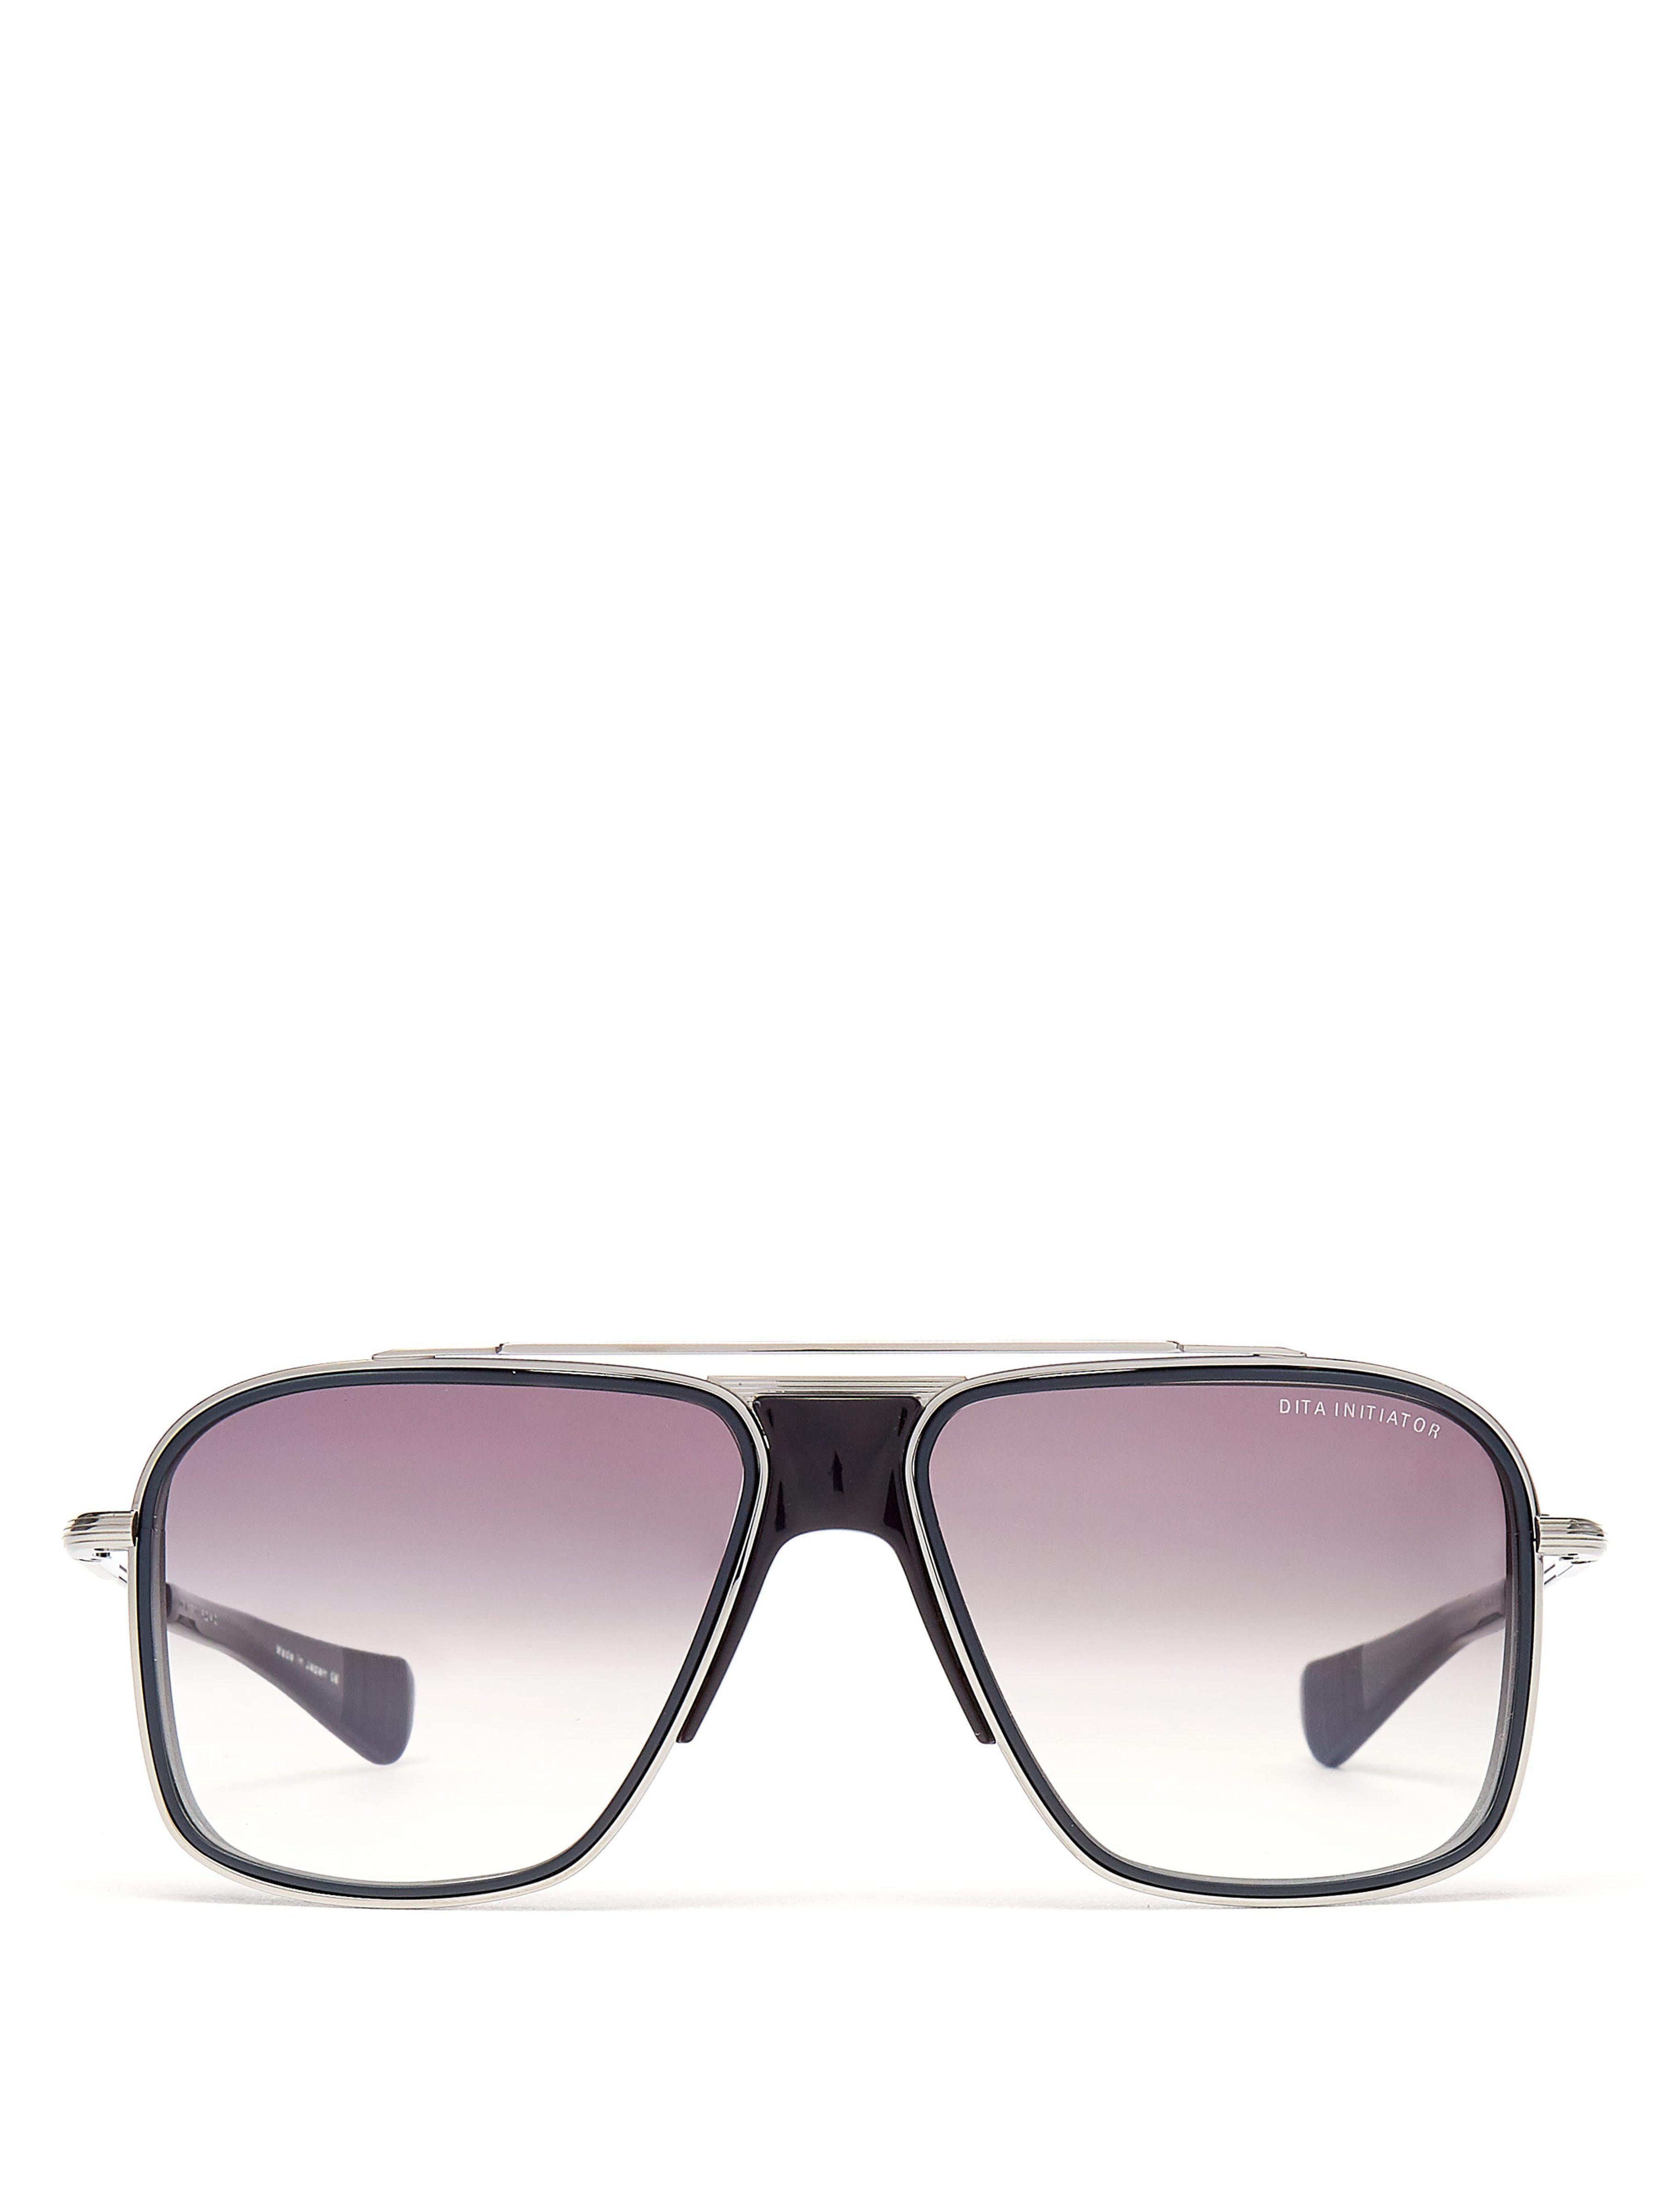 Lyst - Lunettes de soleil aviateur en titane Initiator Dita Eyewear ... e6b9a7e6b1aa